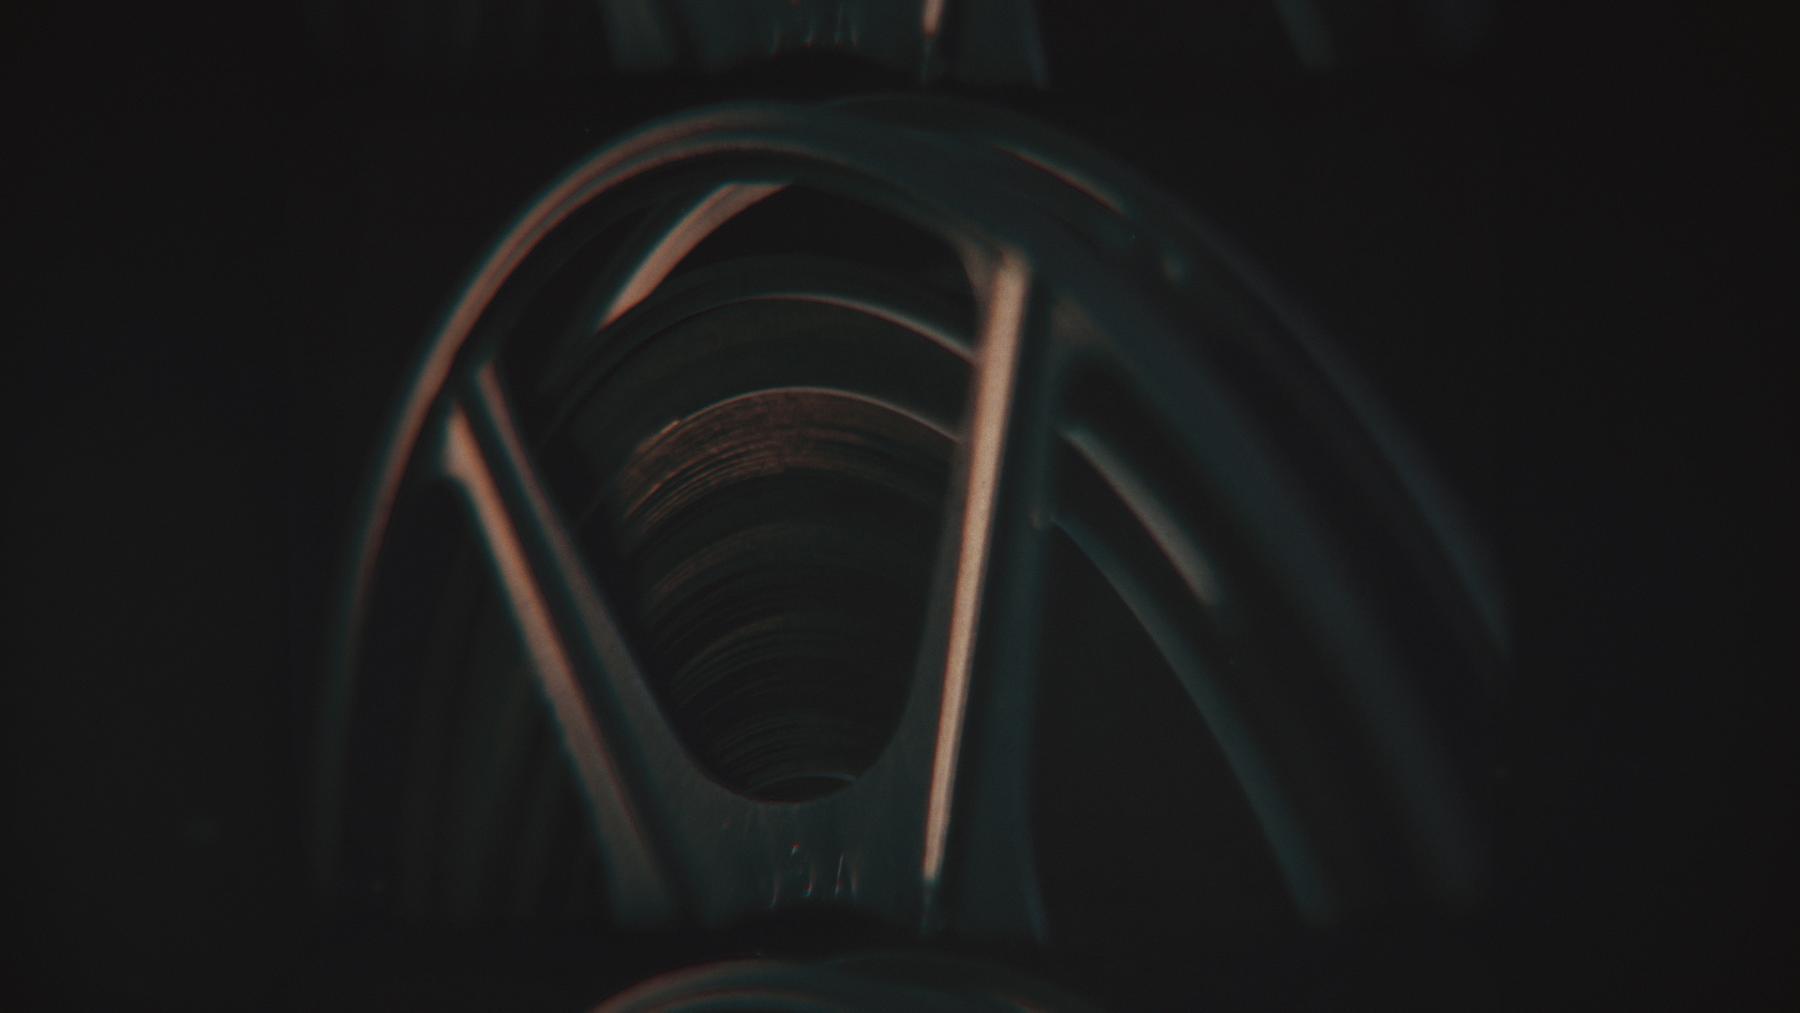 SINISTER_2_BOARDS_02